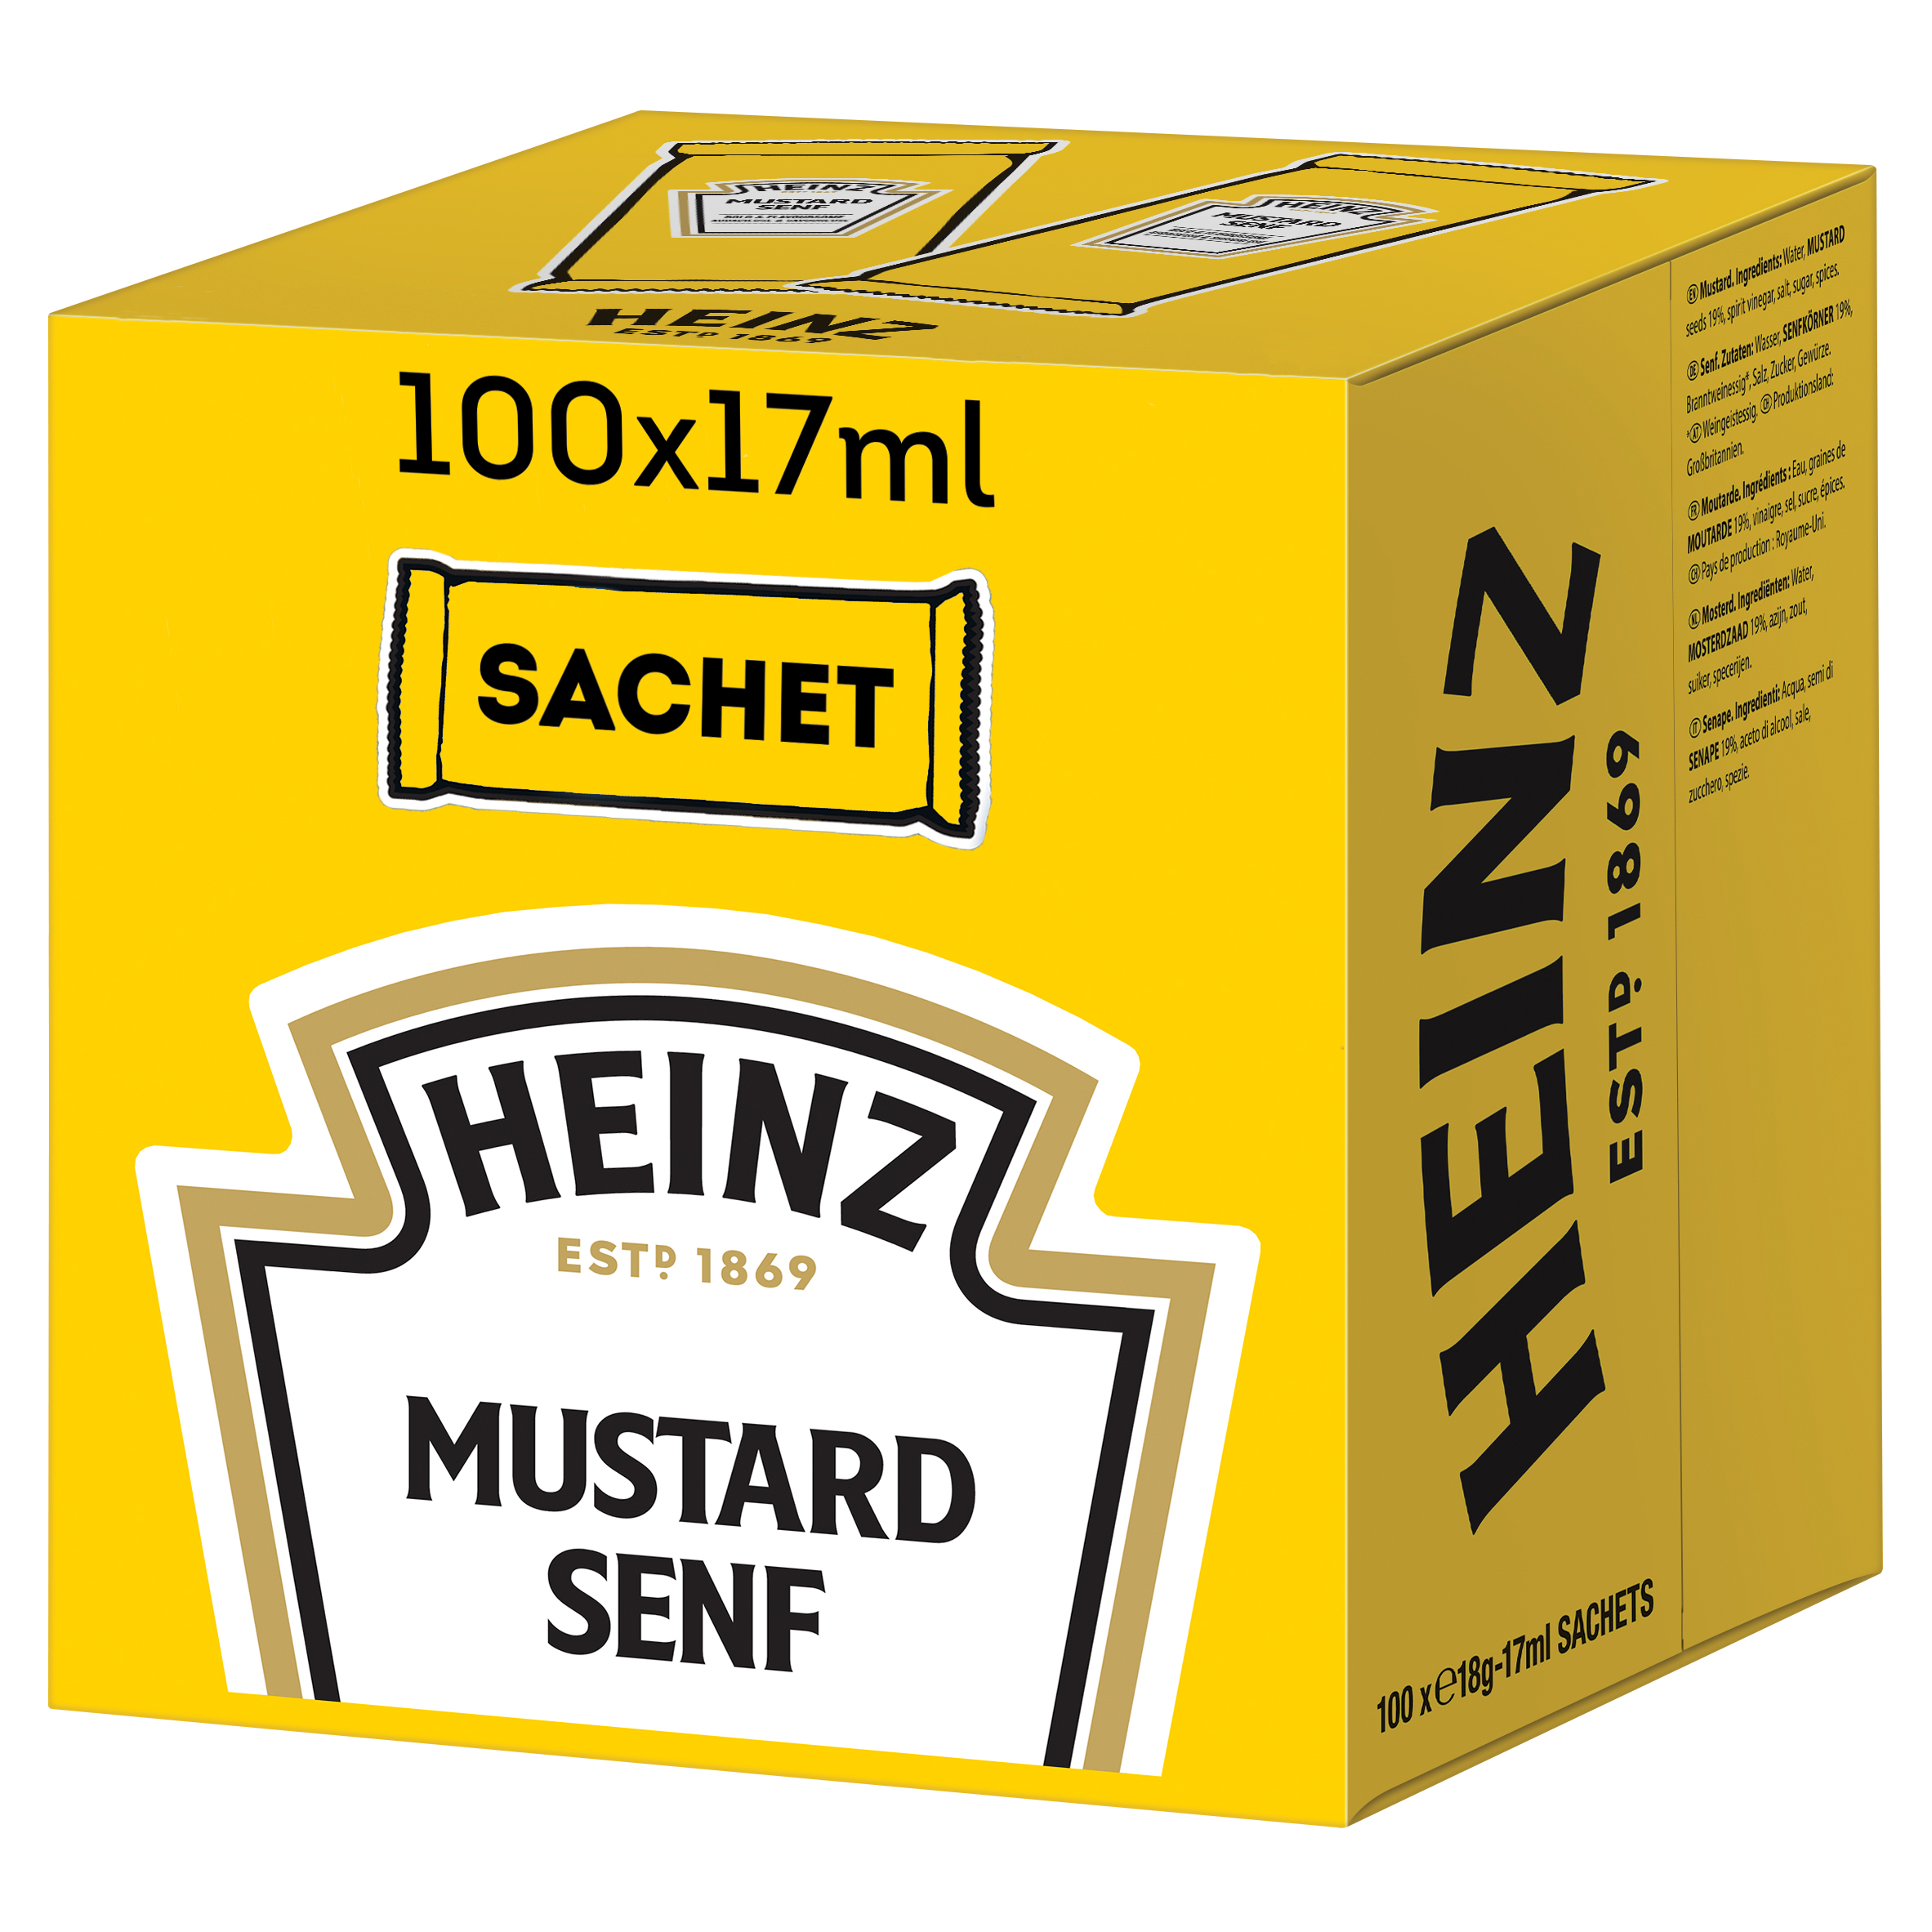 Heinz Mustard 17ml Sachet